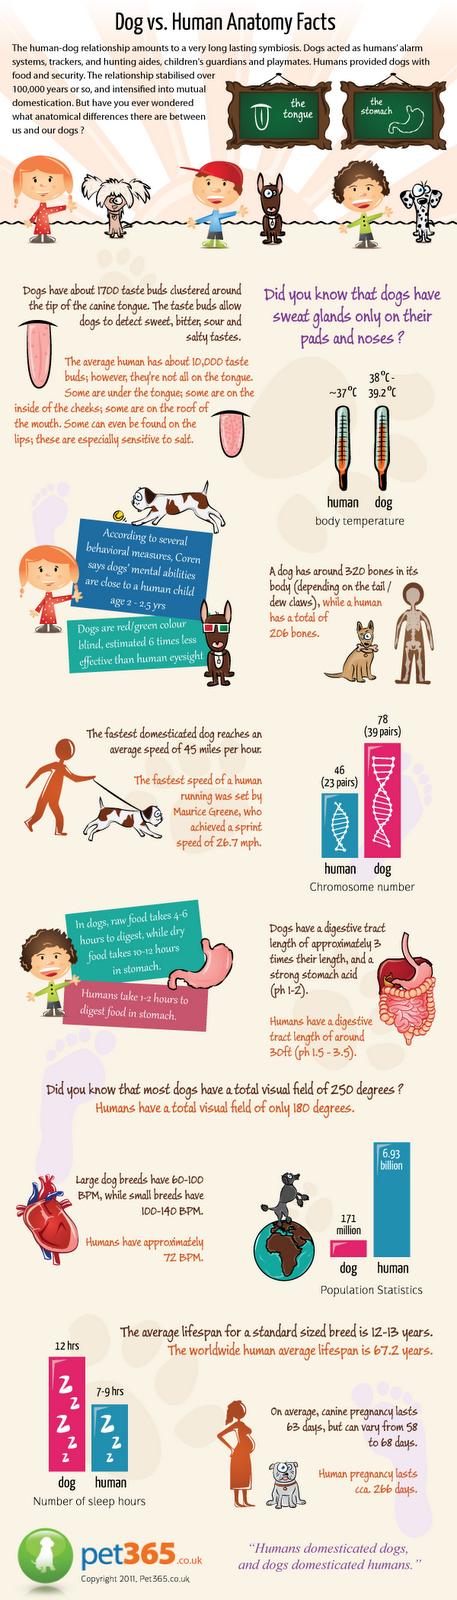 Dog Anatomy Infographic